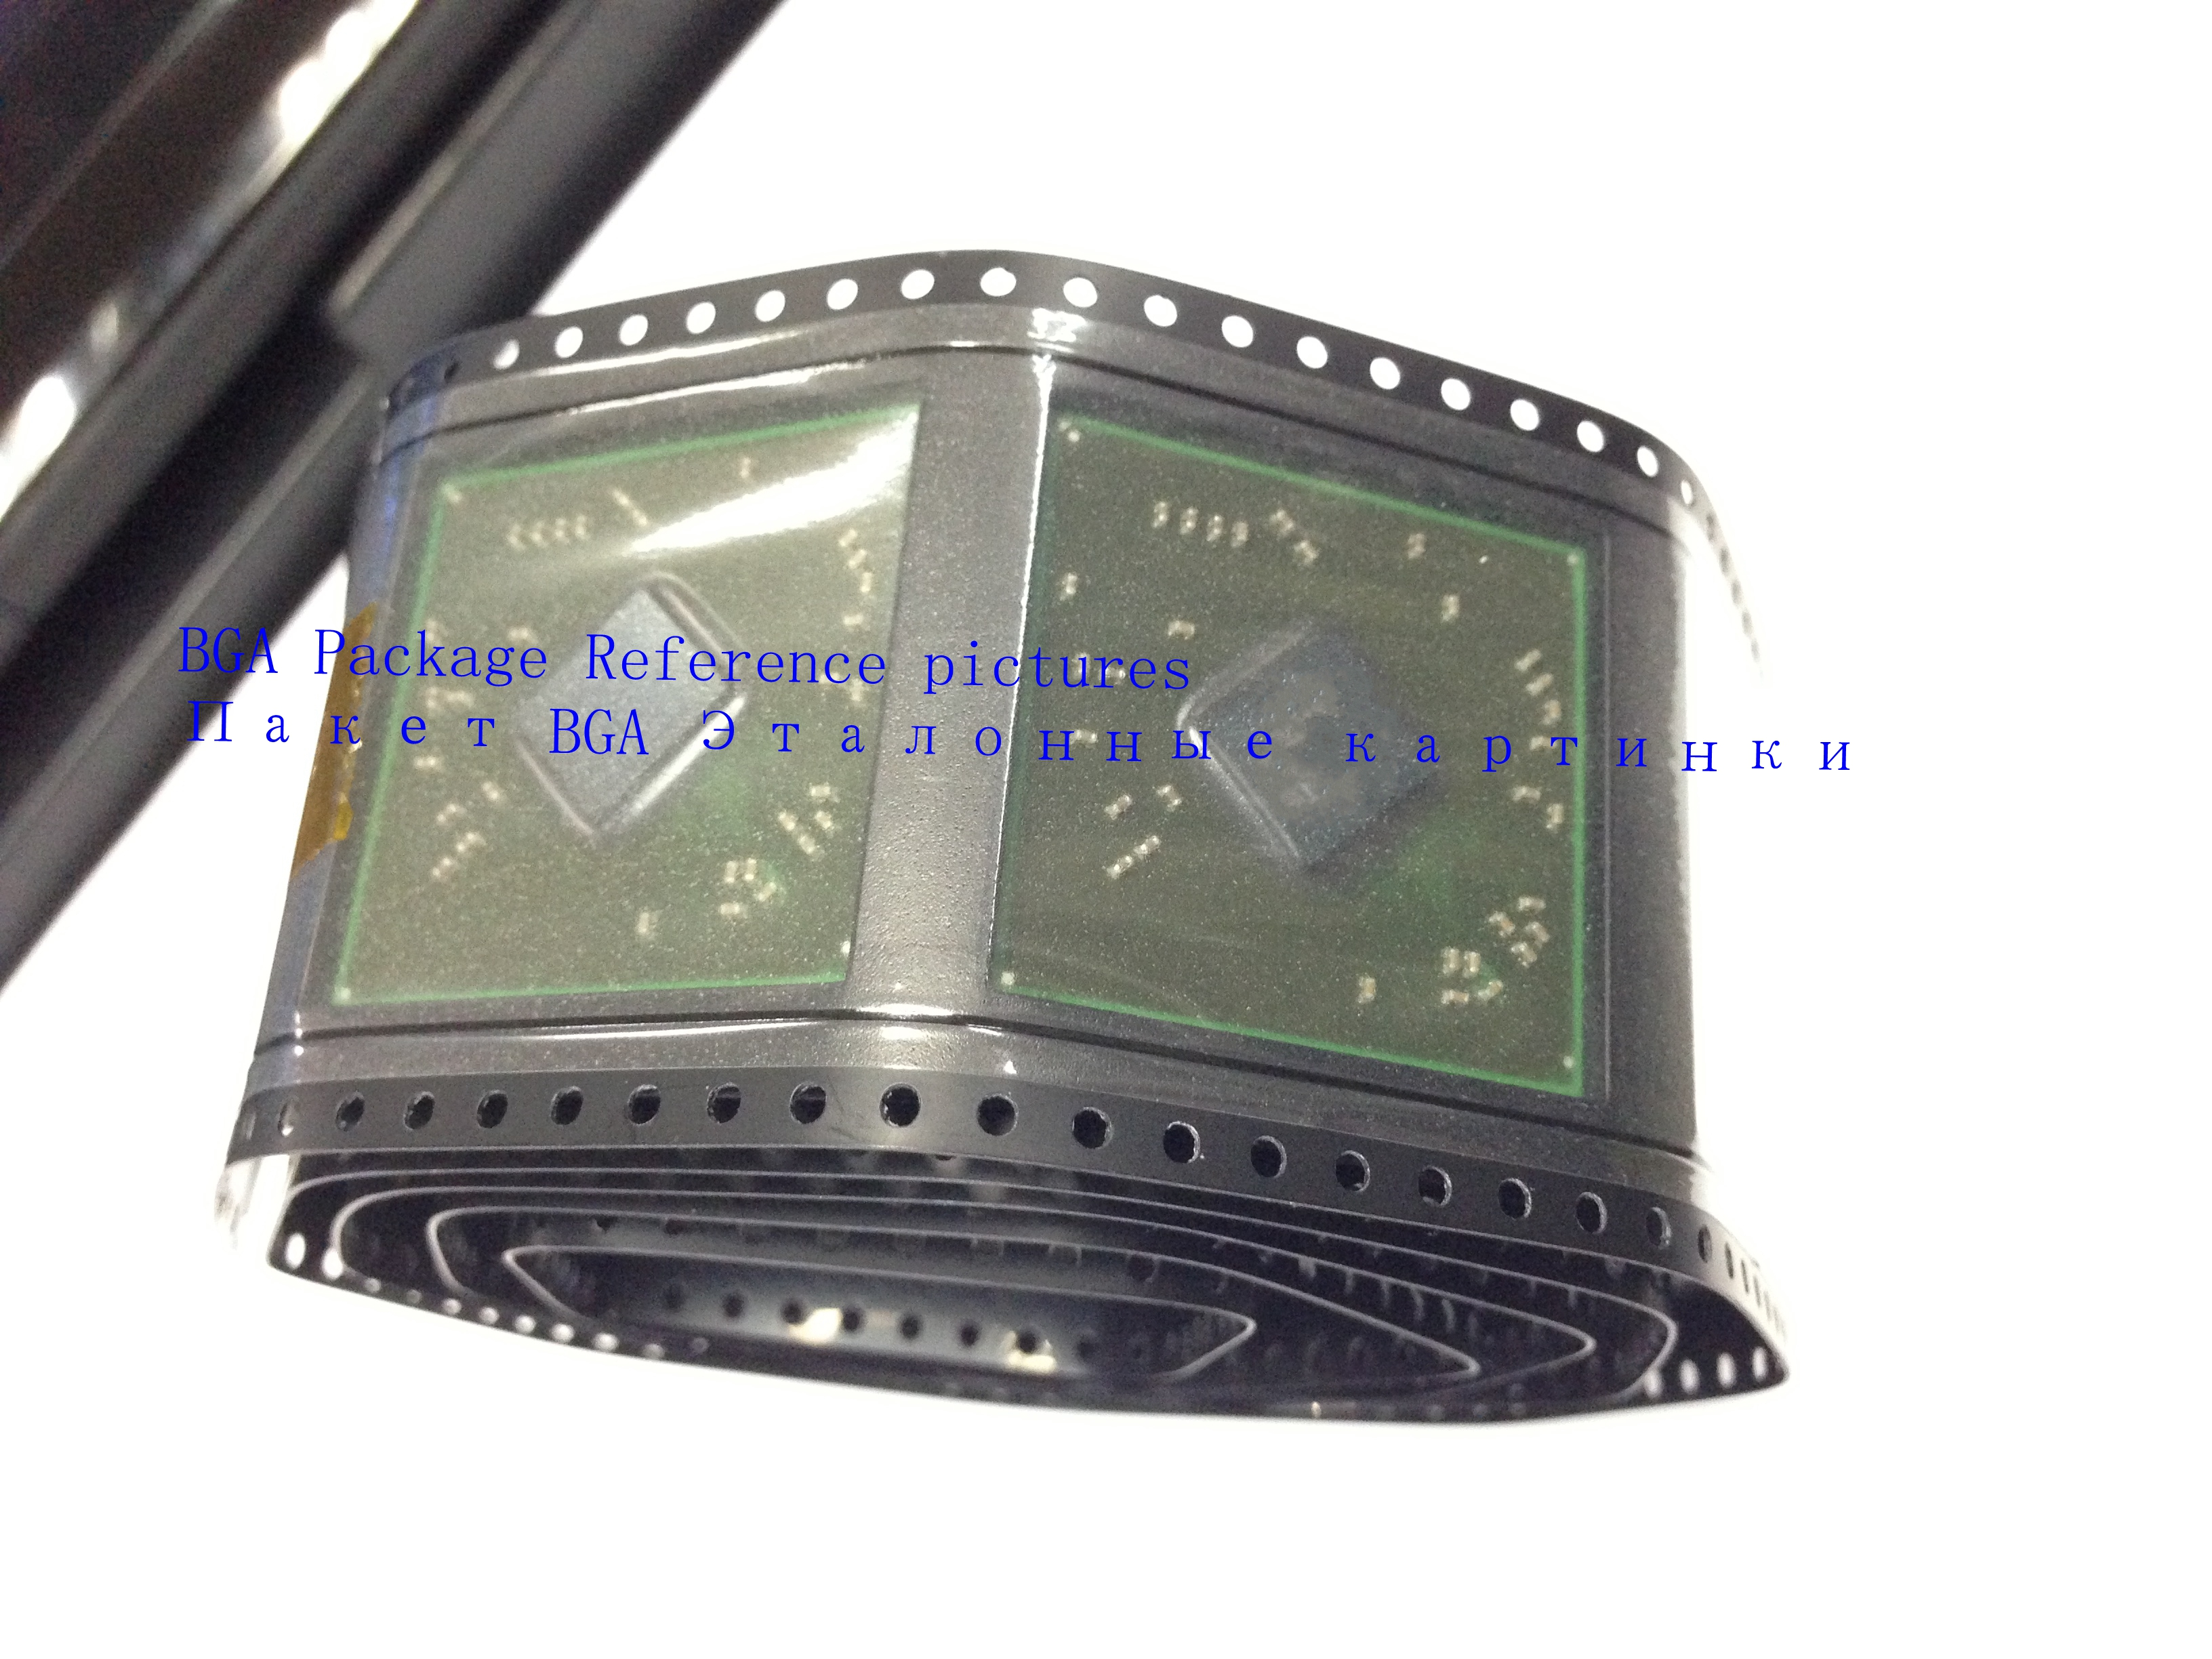 1 pcs/lot 100% Nouveau N11P-GE1-A3 N11P GE1 A3 128Bit 256 MB BGA Chipset1 pcs/lot 100% Nouveau N11P-GE1-A3 N11P GE1 A3 128Bit 256 MB BGA Chipset